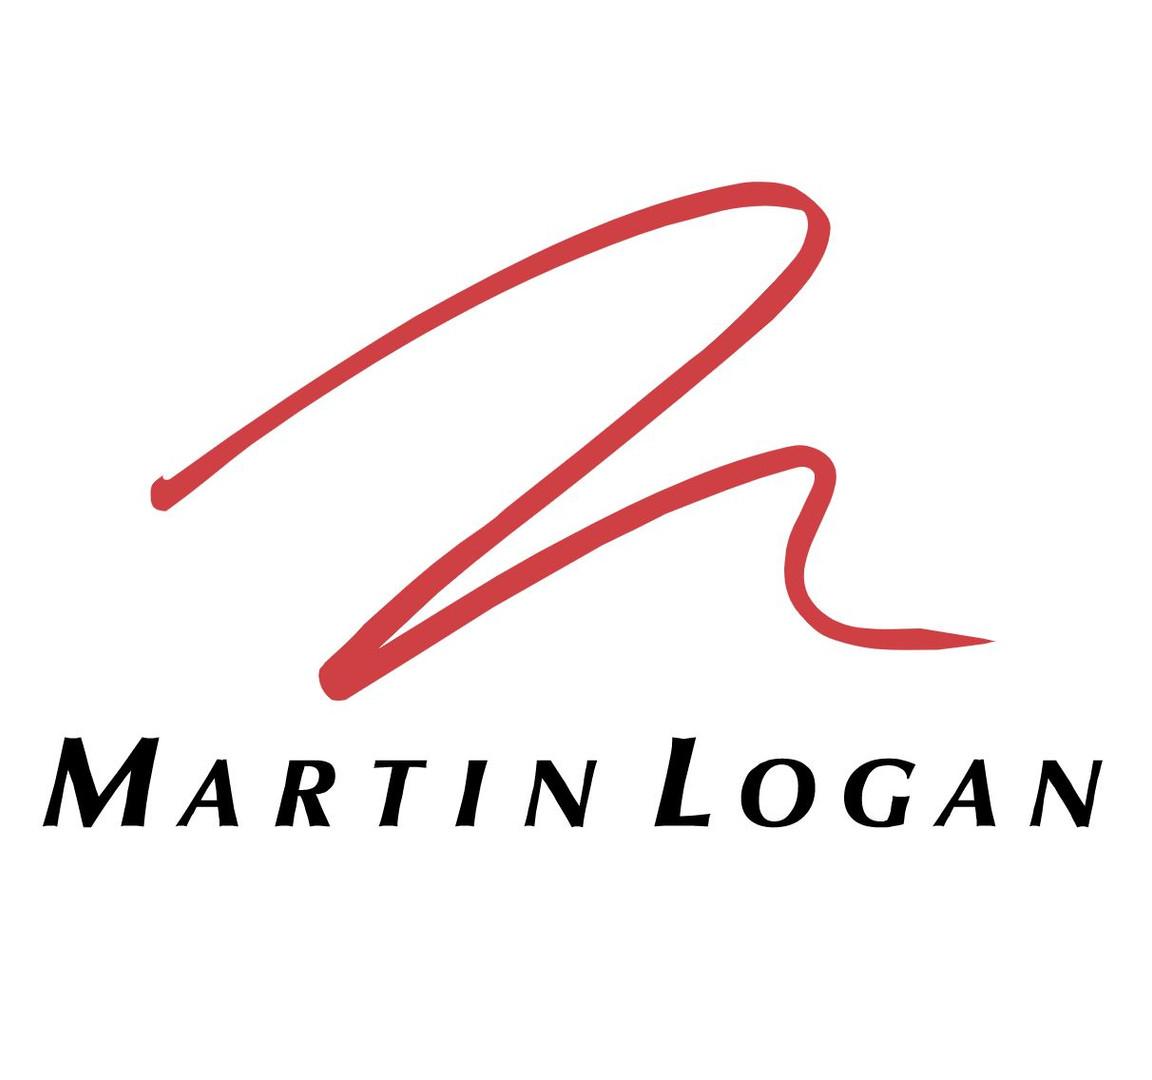 Martin Logan logo.JPG